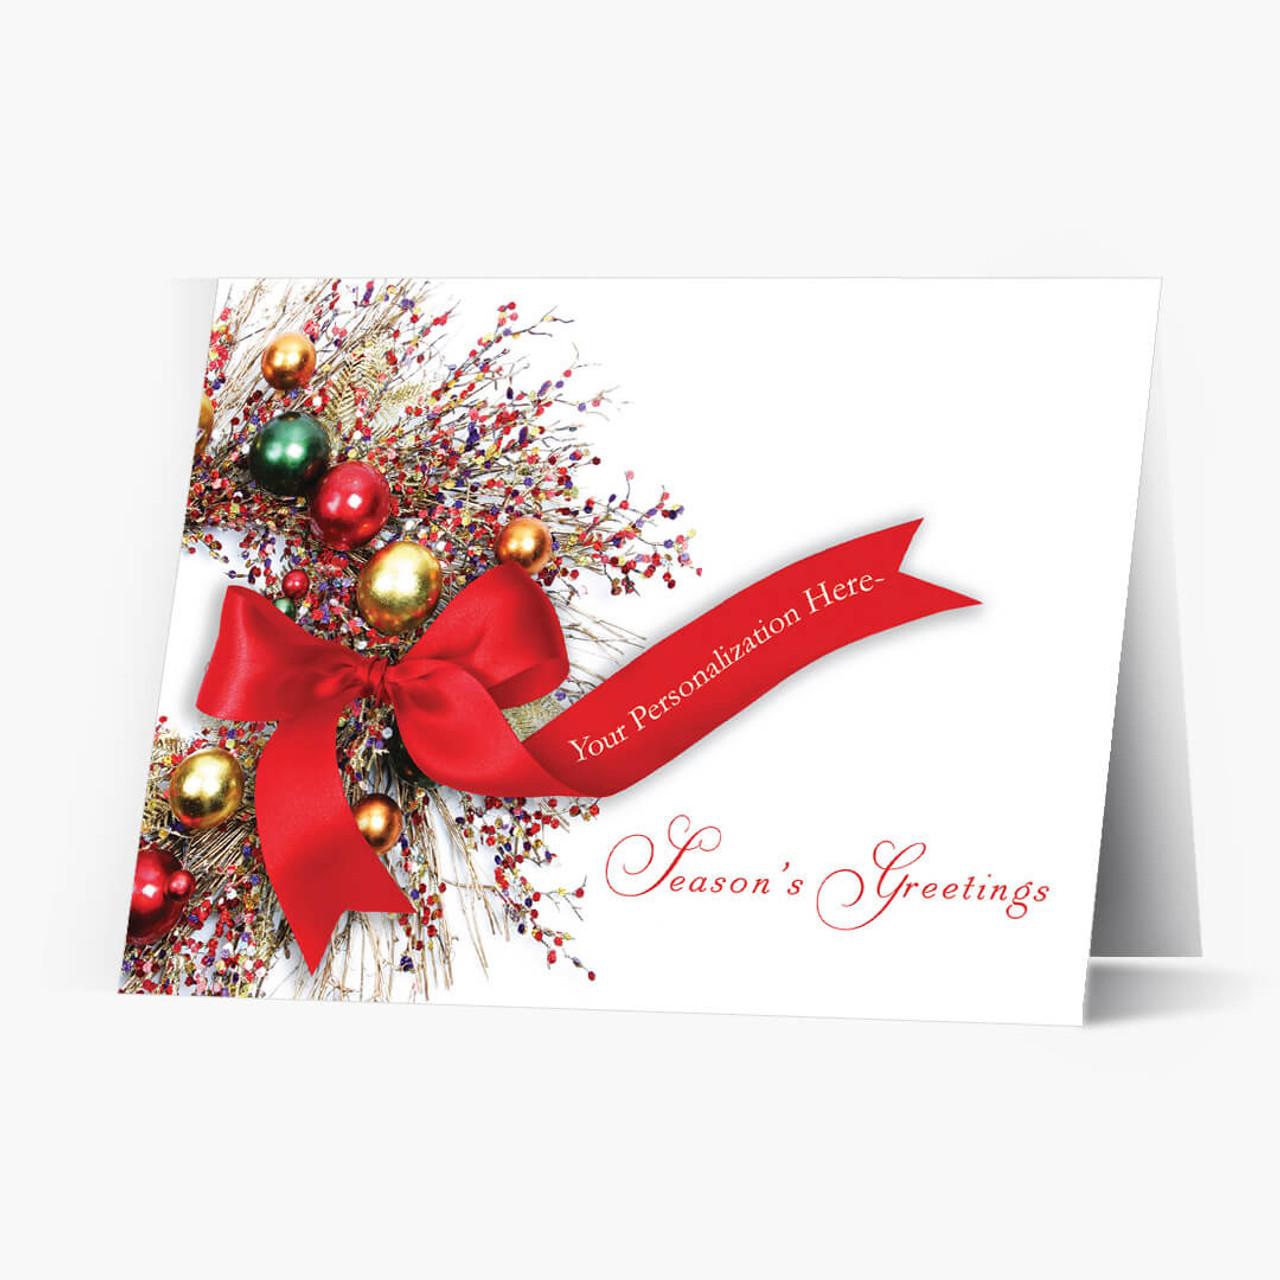 Season's Greetings Wreath Christmas Card